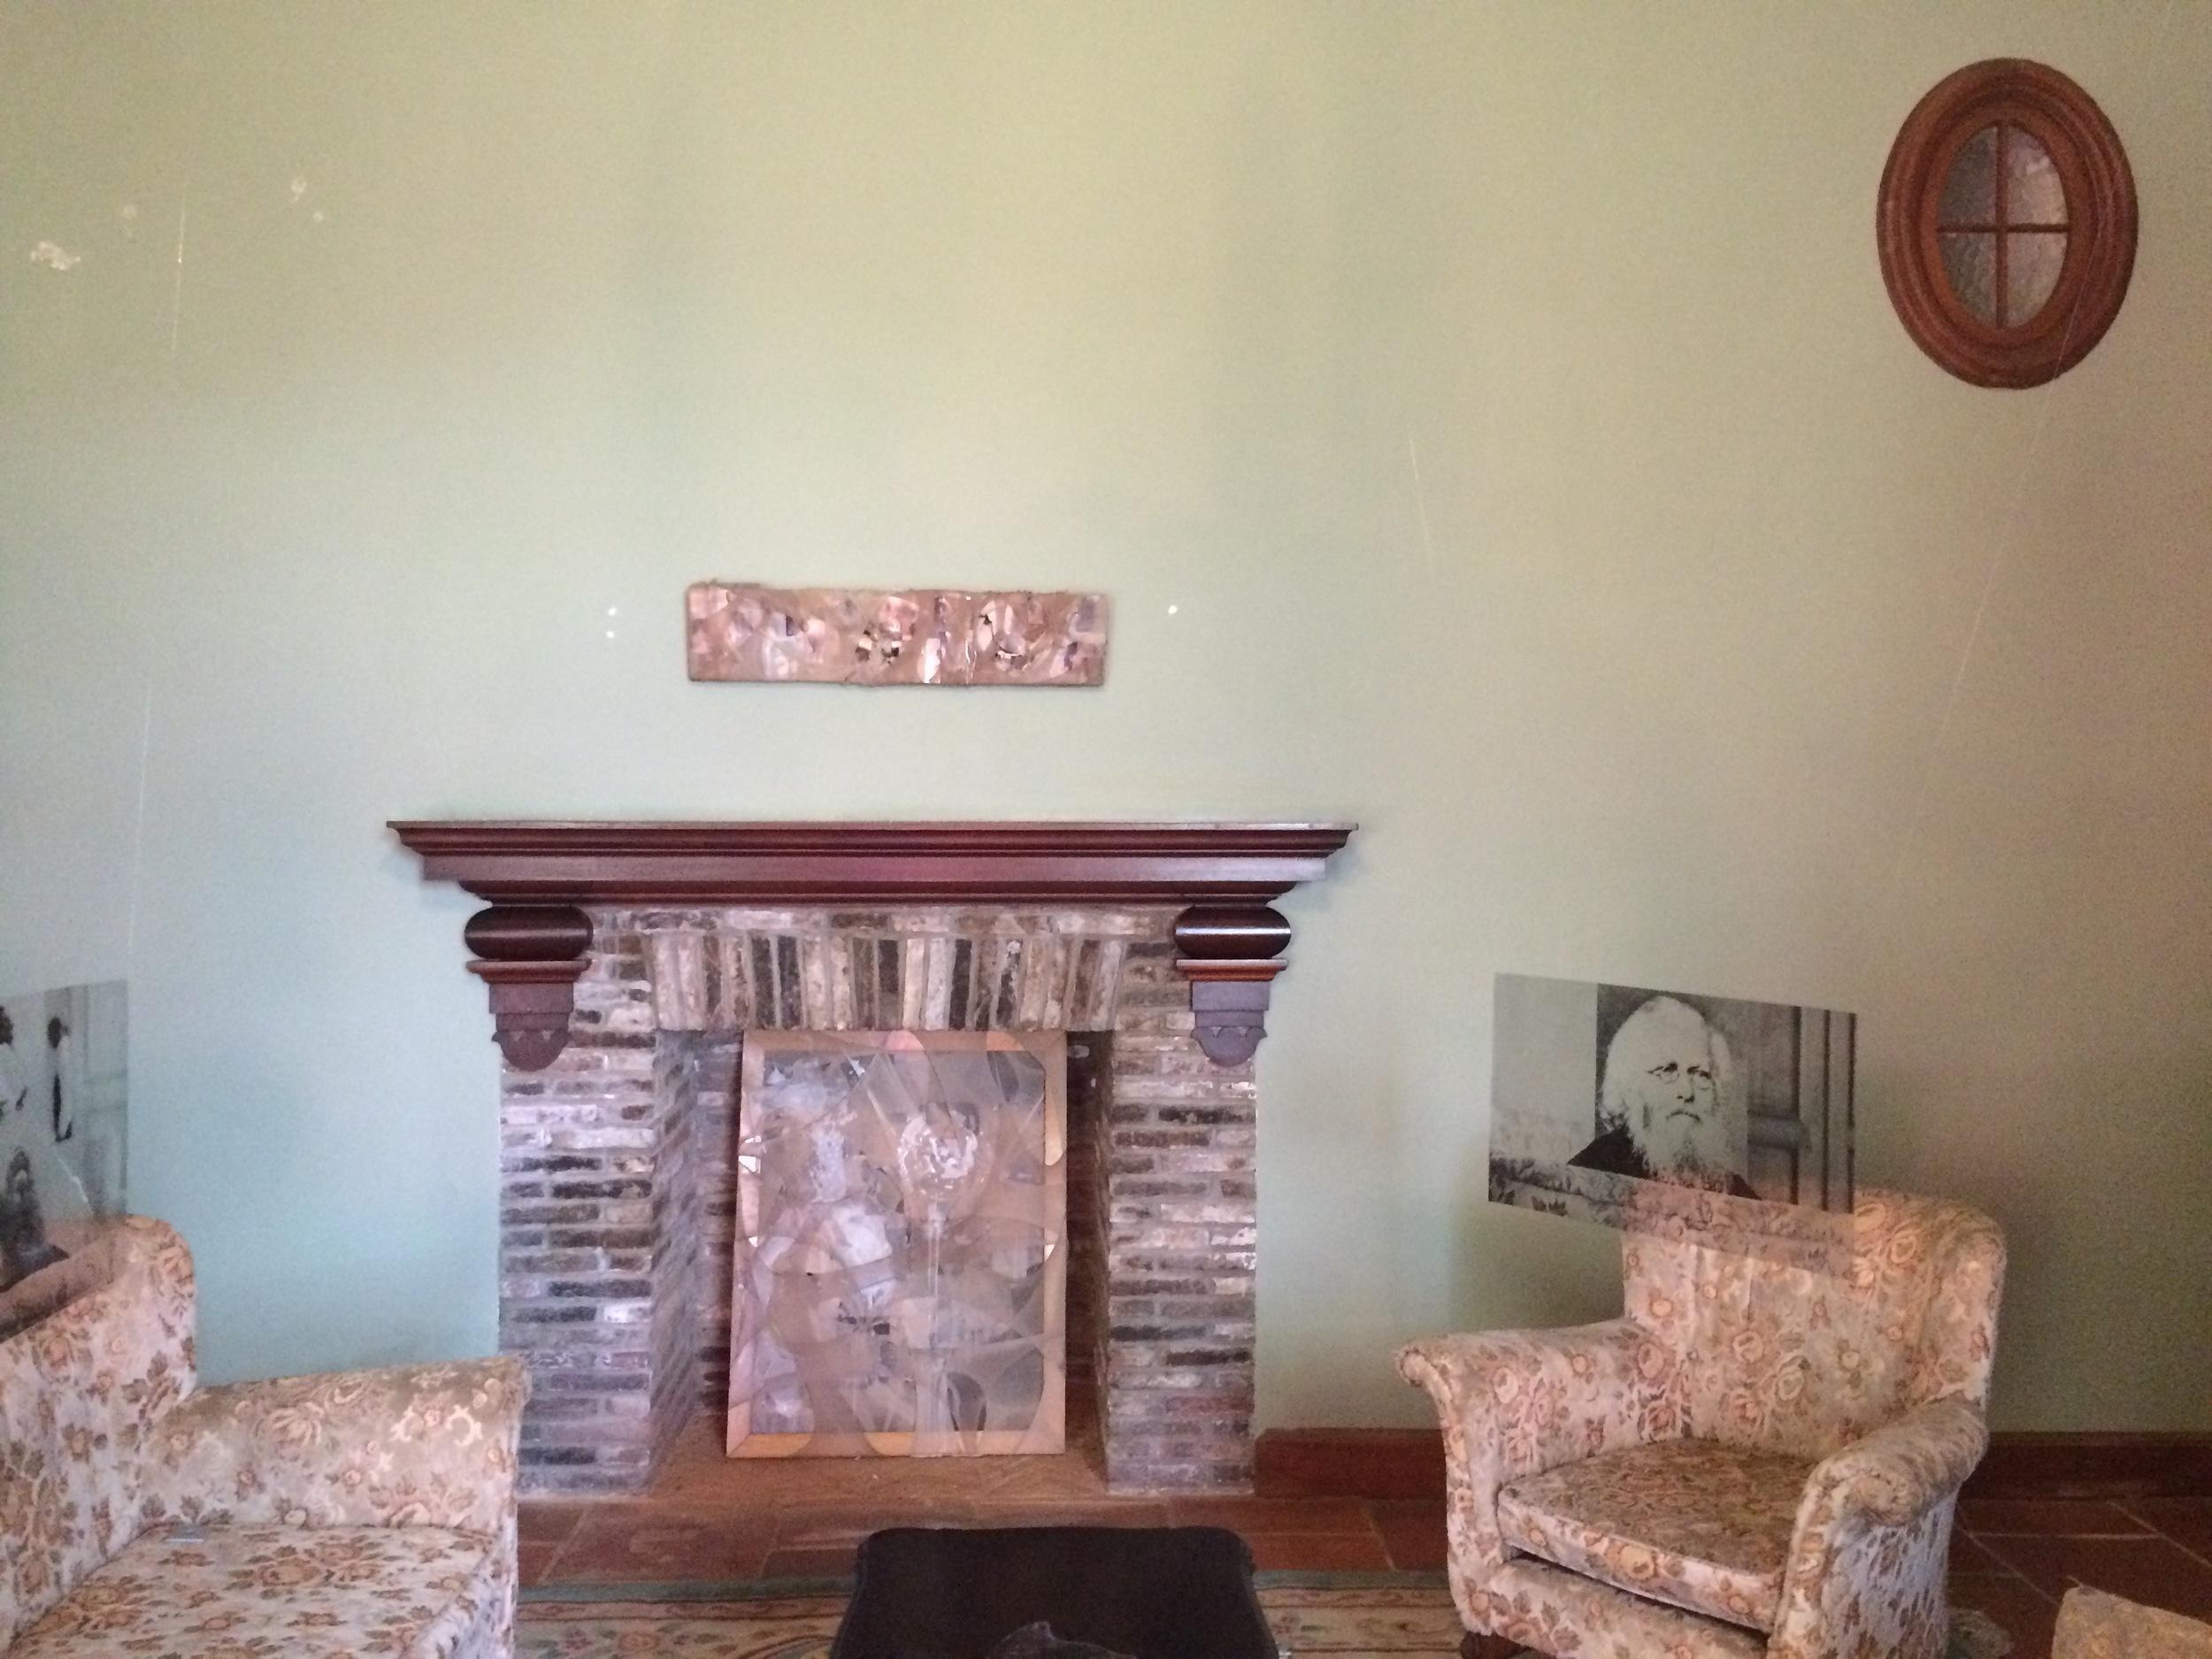 Marcus Viljoen (above furniture) and Alice Gauntlett (fireplace)